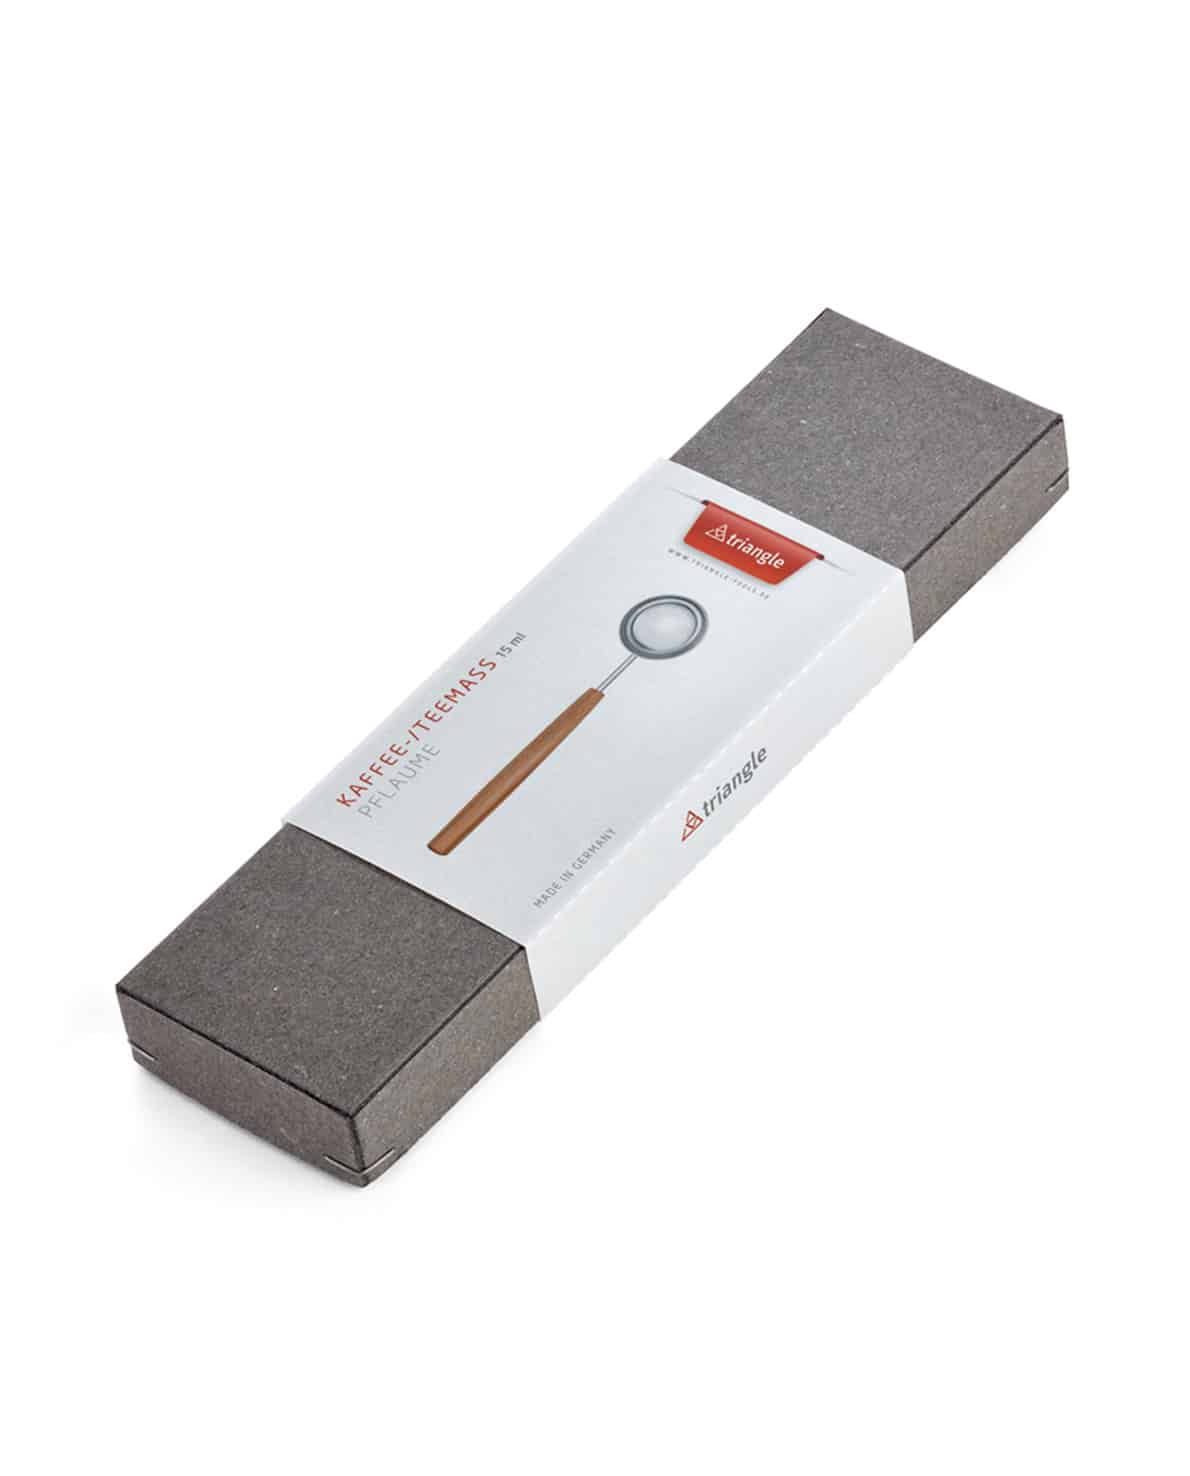 triangle Kaffemaß und Teemaß im Geschenkkarton Holu Soul Holzgriff Pflaume Holz